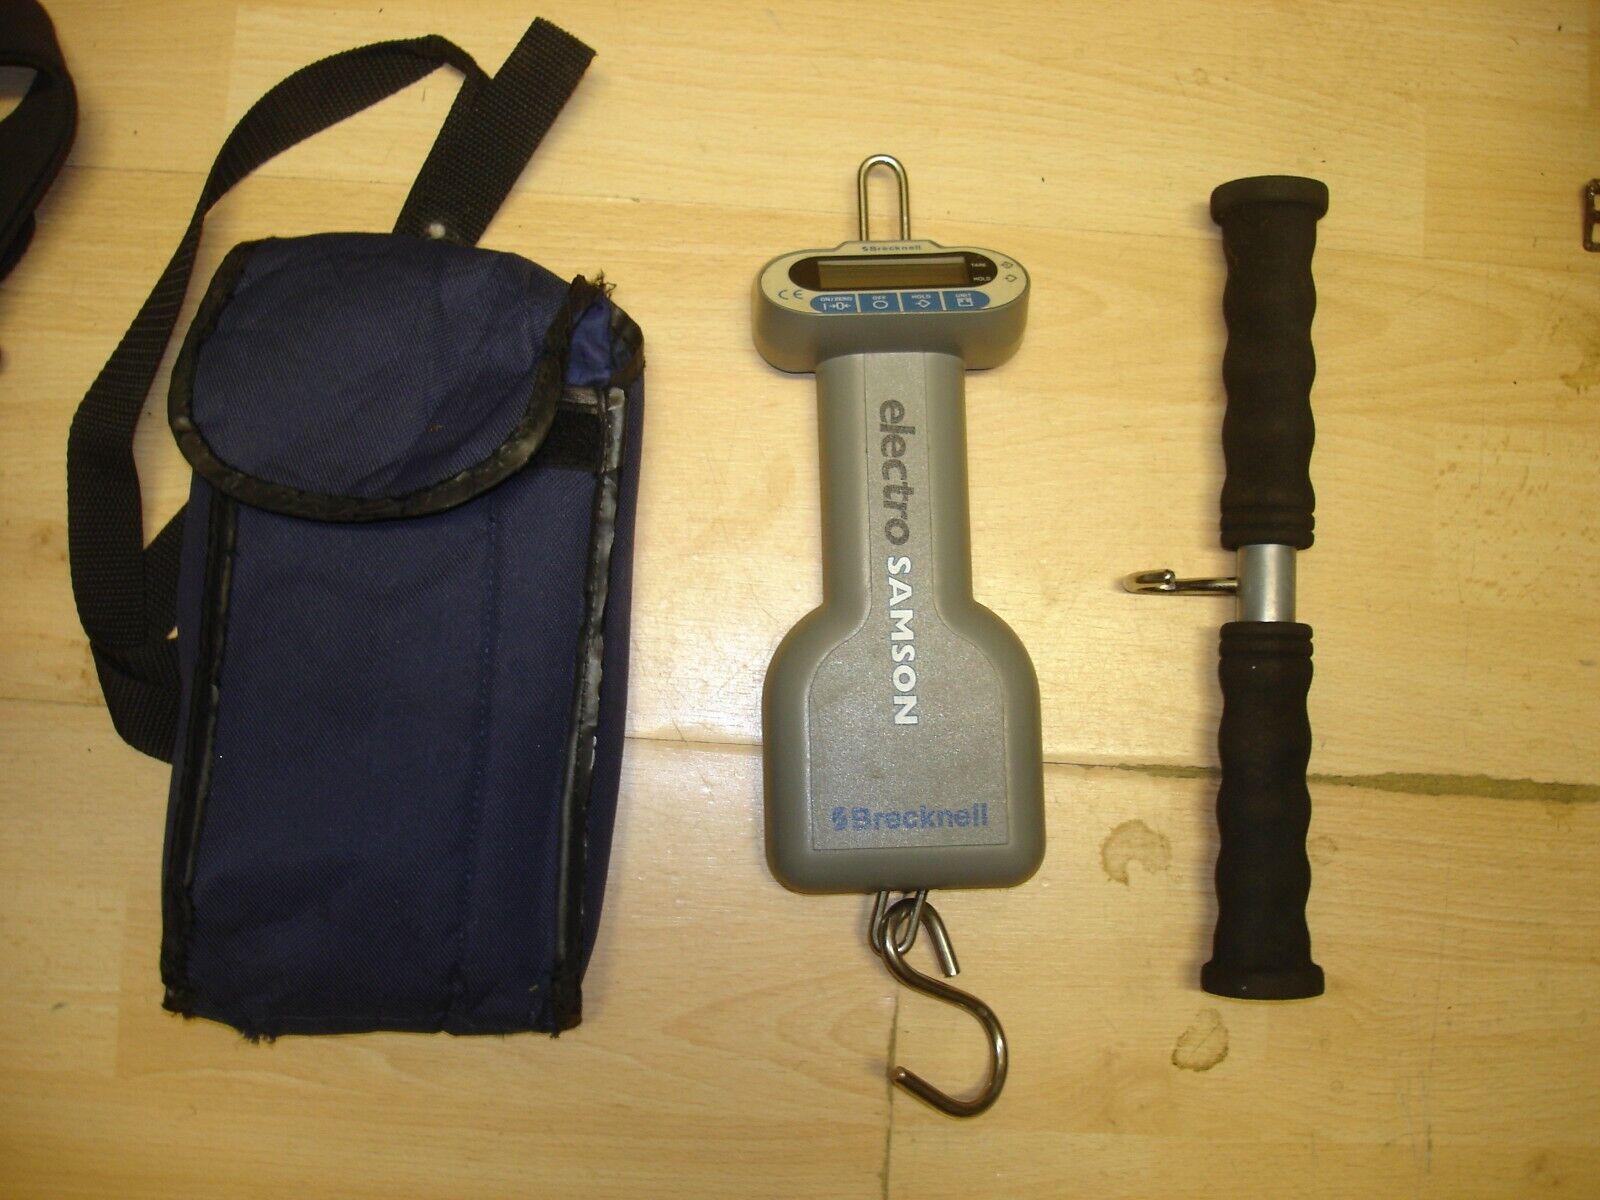 Electro Samson becknell Match Pesca pesare in Scale 25kg x 20gms CORNICE